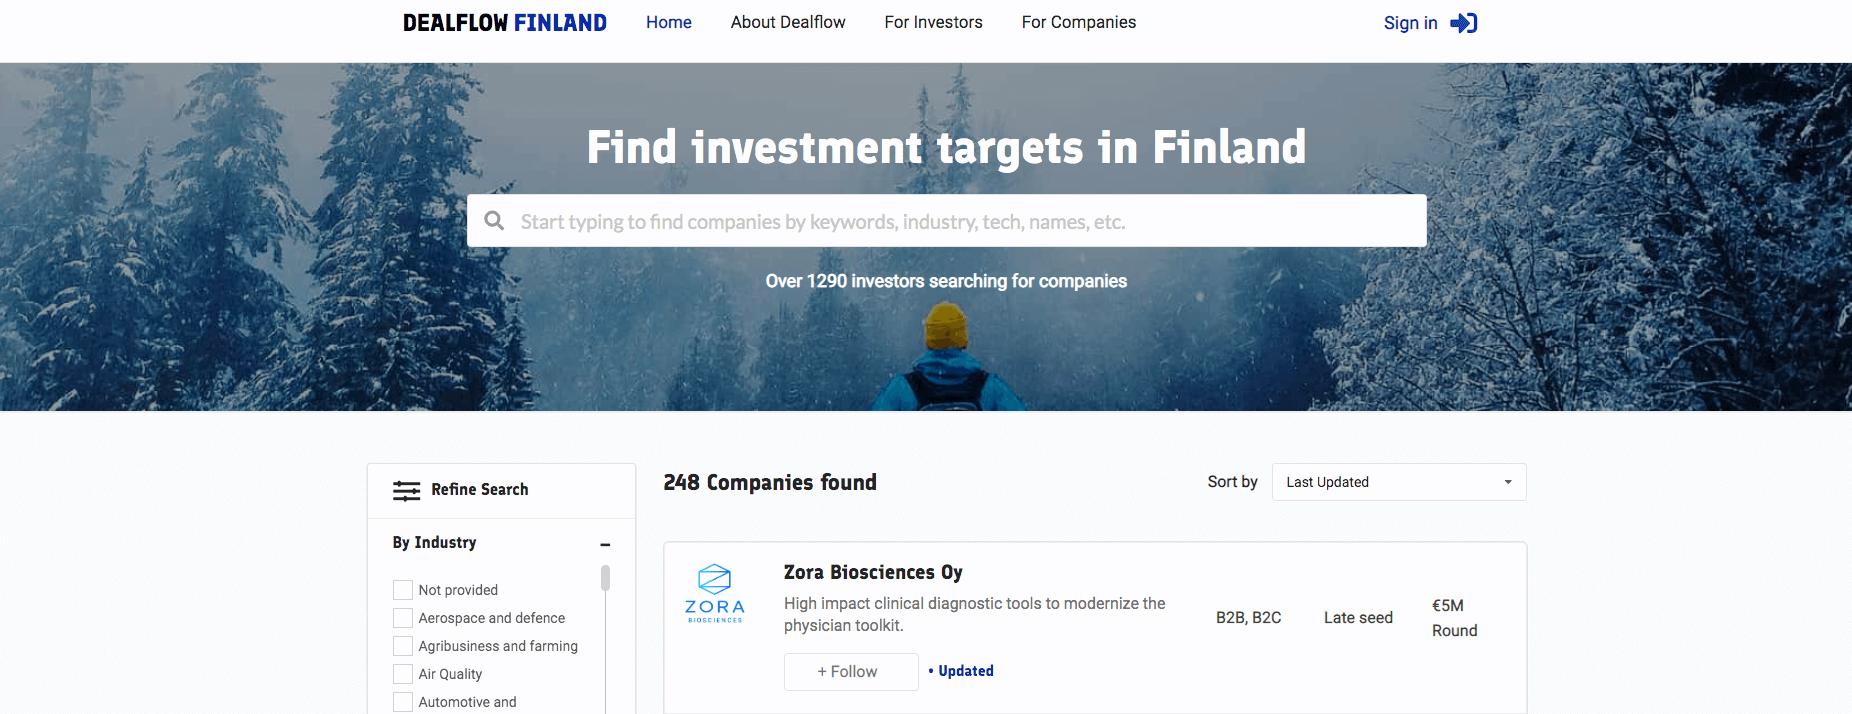 Dealflow business finland